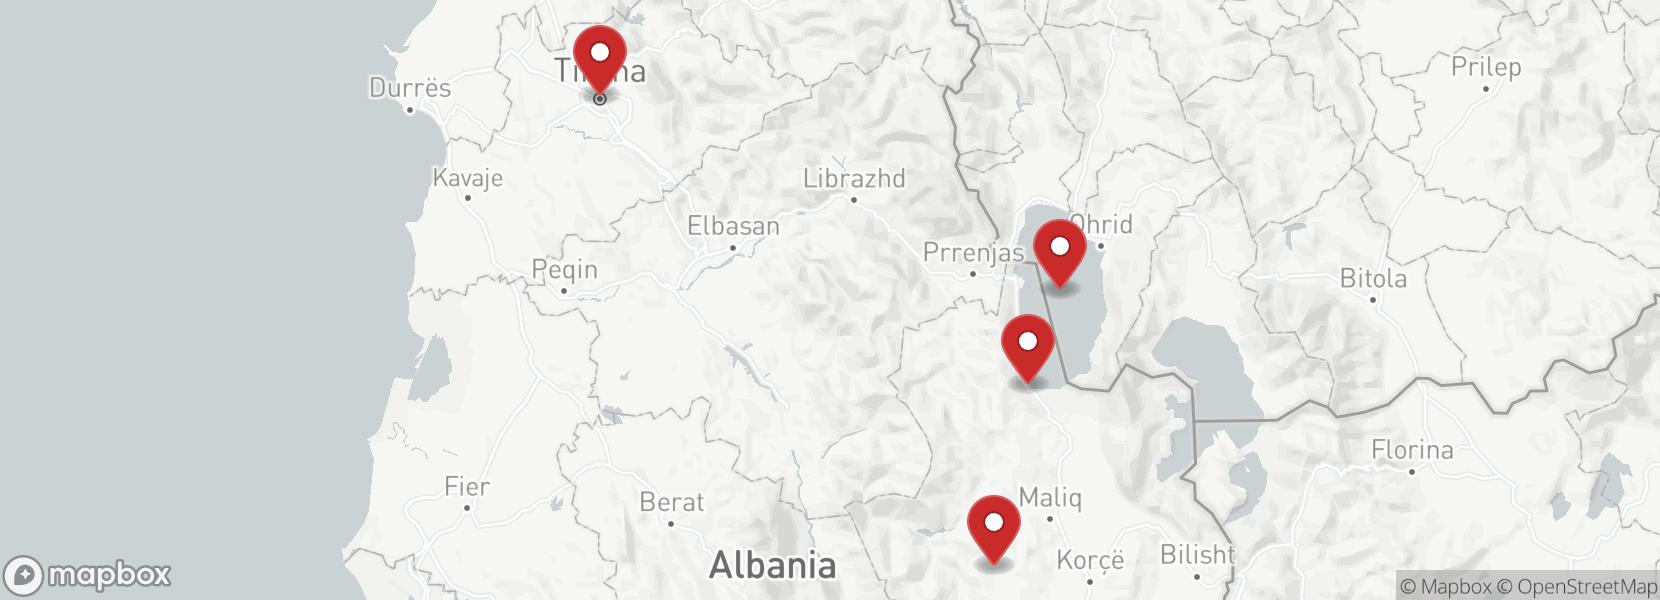 Itinerario Viaggio in moto enduro Albania enduro